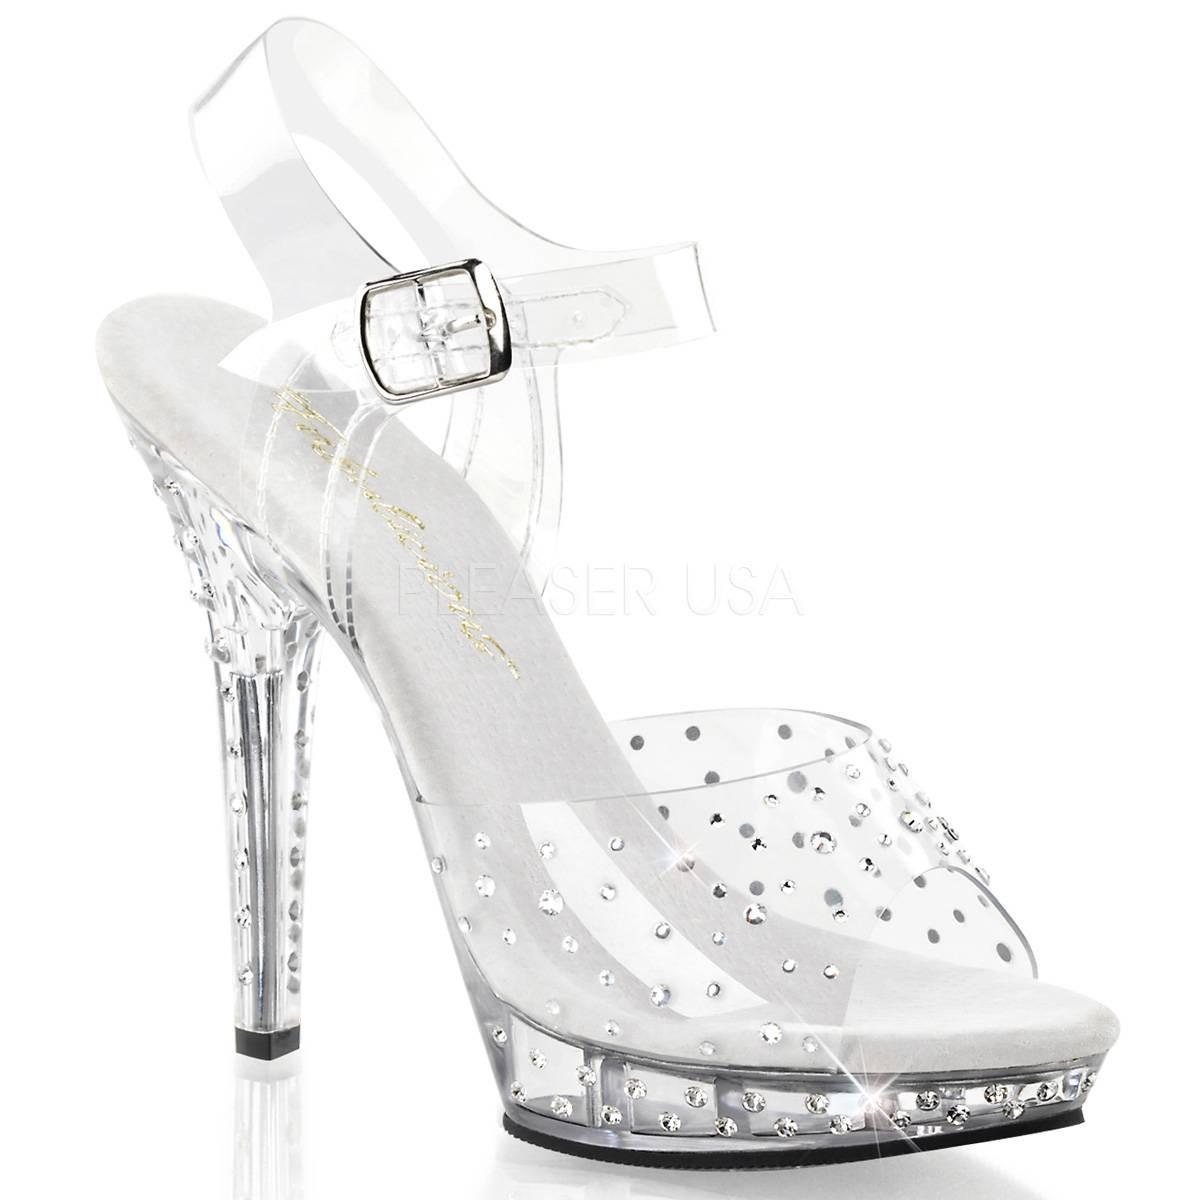 Sandalen für Frauen - LIP 108RS ° Damen Sandalette ° Transparent Matt ° Fabulicious  - Onlineshop RedSixty